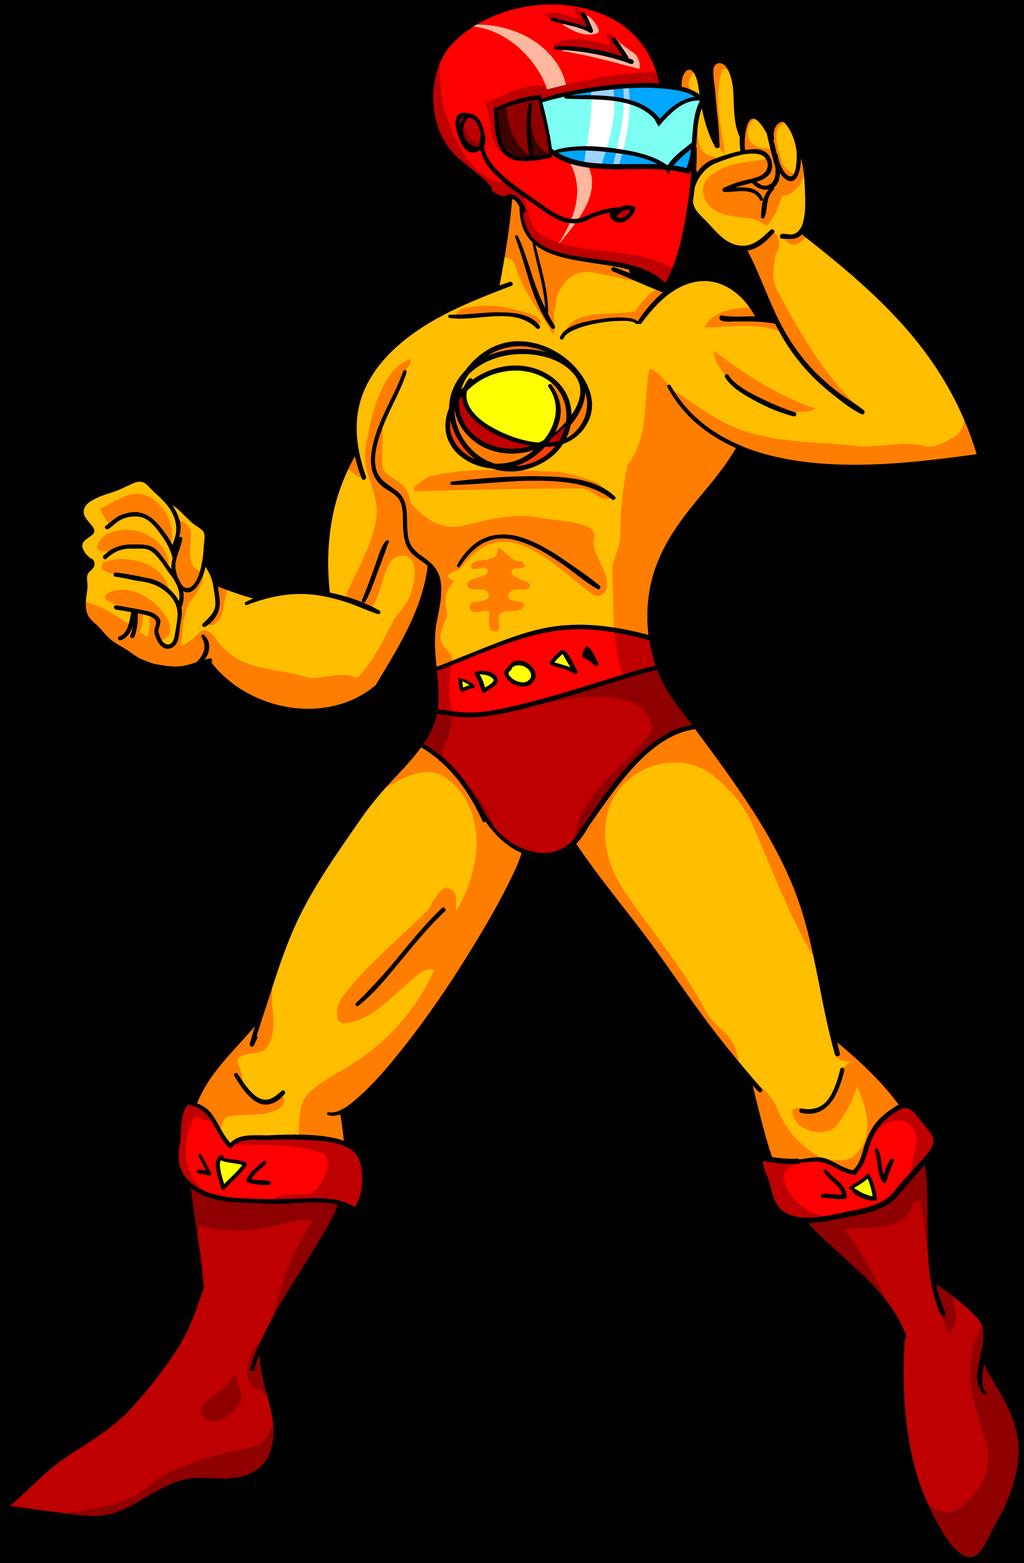 Character Design Hero : Game character design superhero archetype by